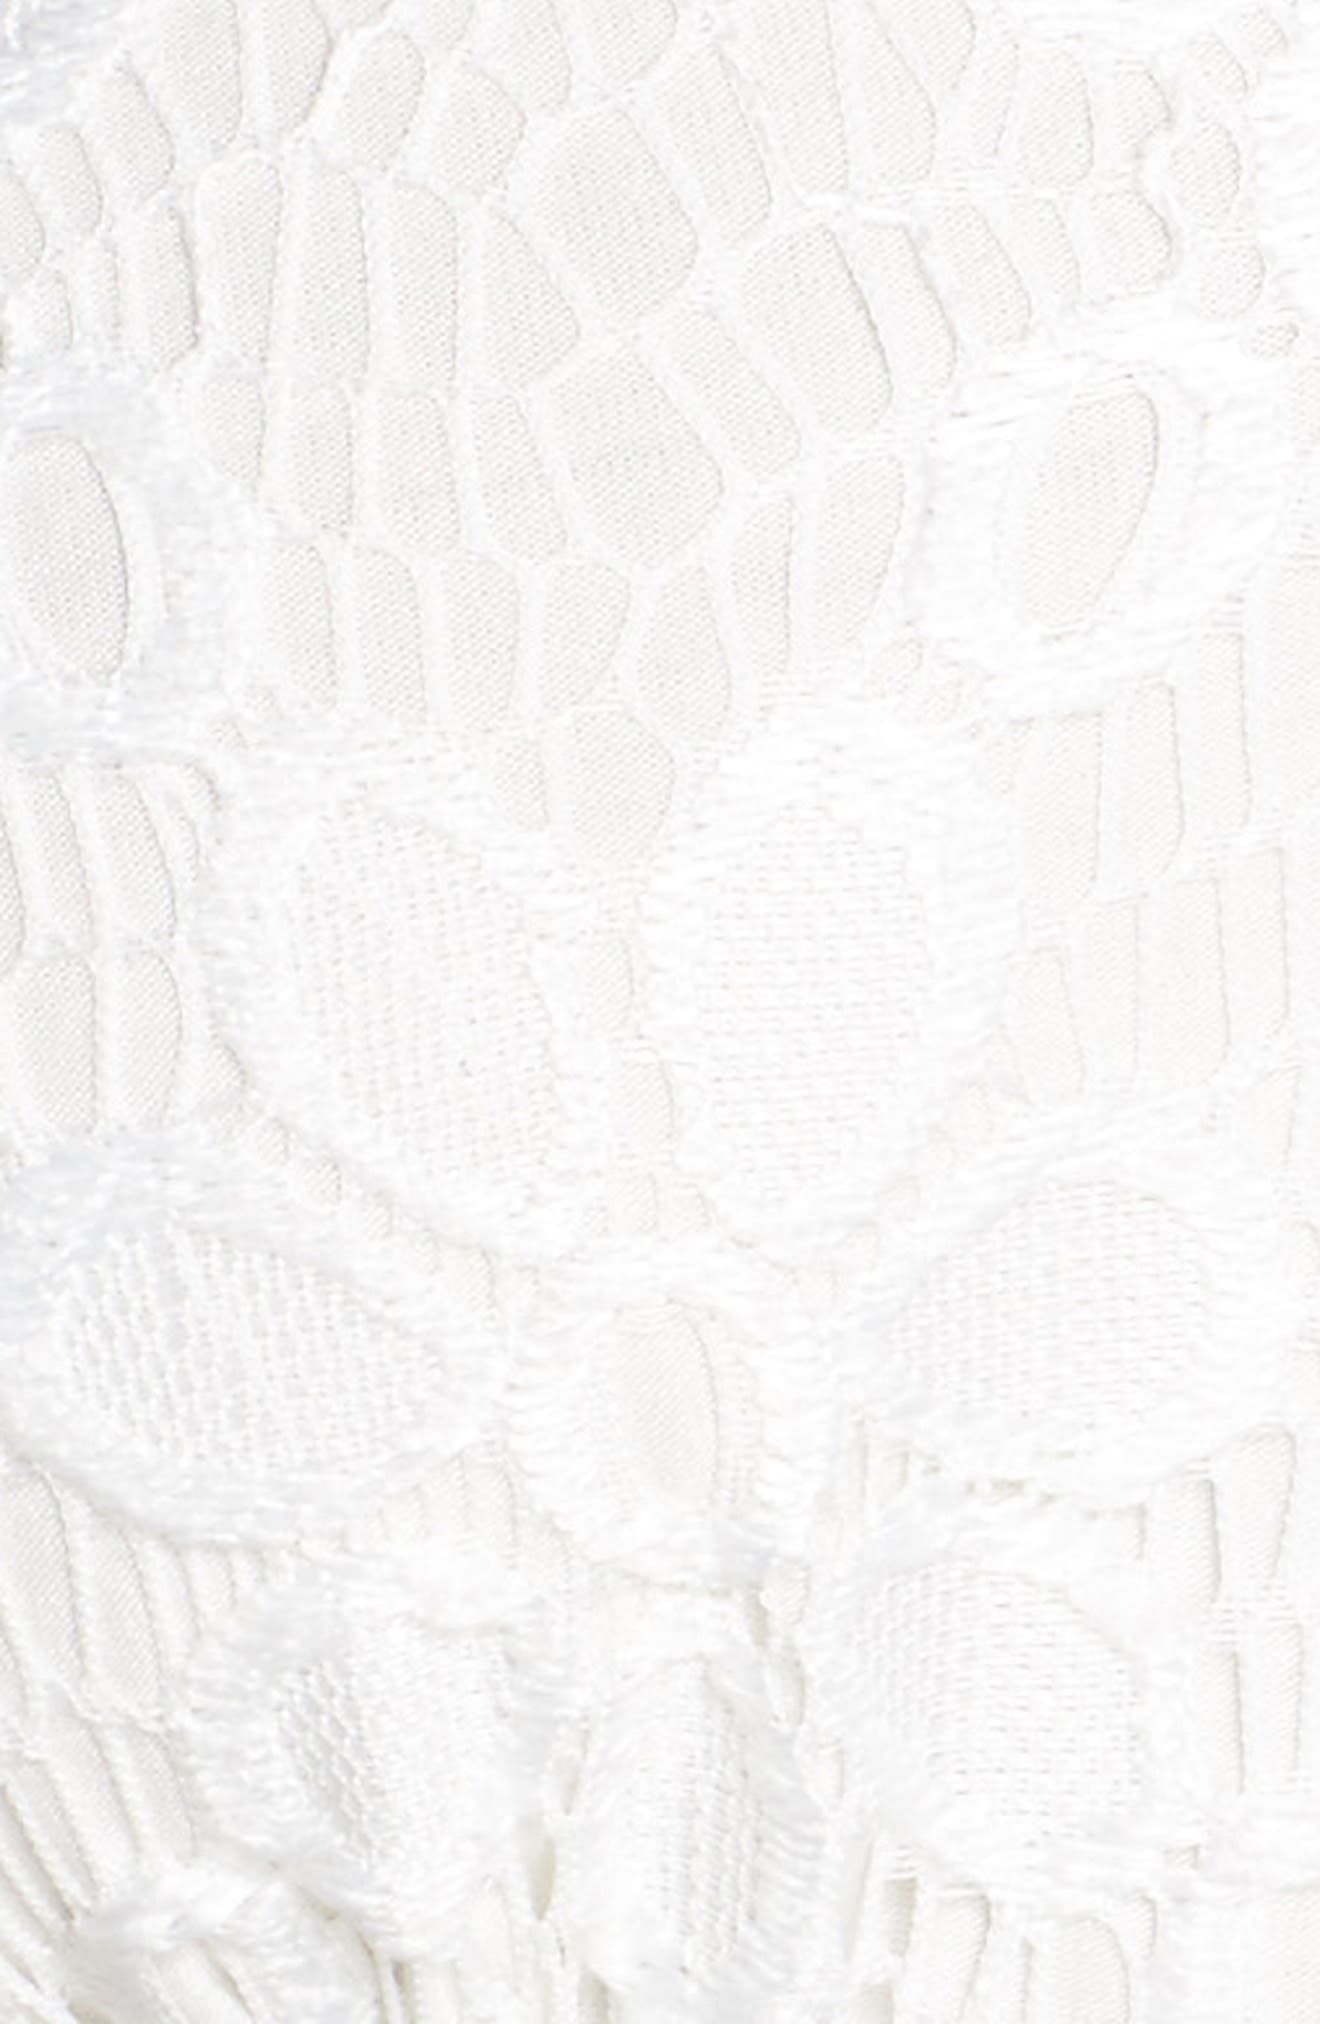 Intimately FP Aria Longline Bralette,                             Alternate thumbnail 7, color,                             White